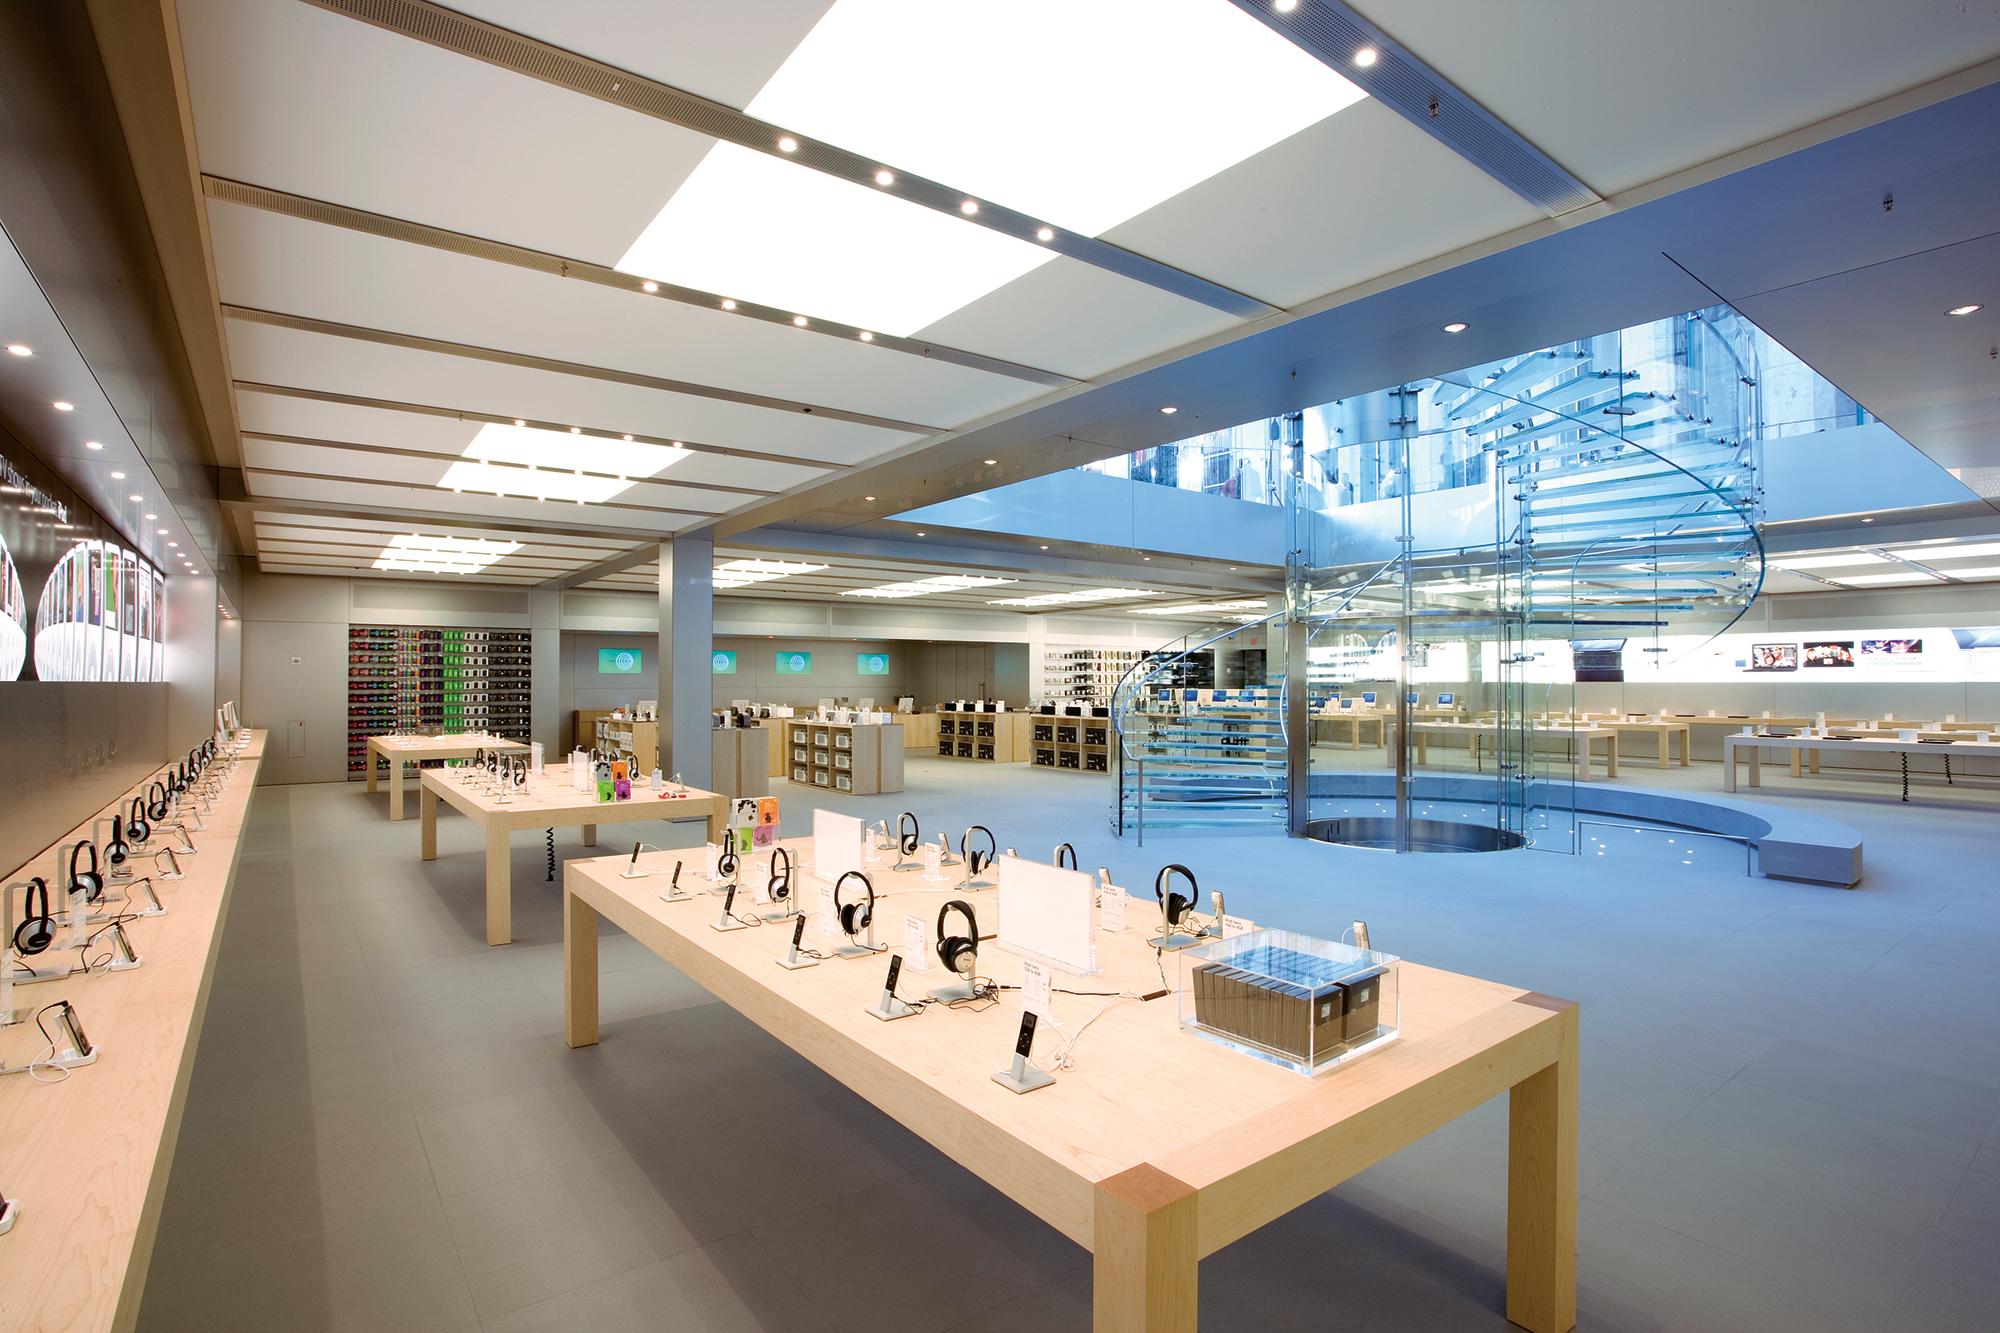 Apple Store Fifth Avenue Interior 小売店のデザイン, ストアデザイン, Pc 壁紙